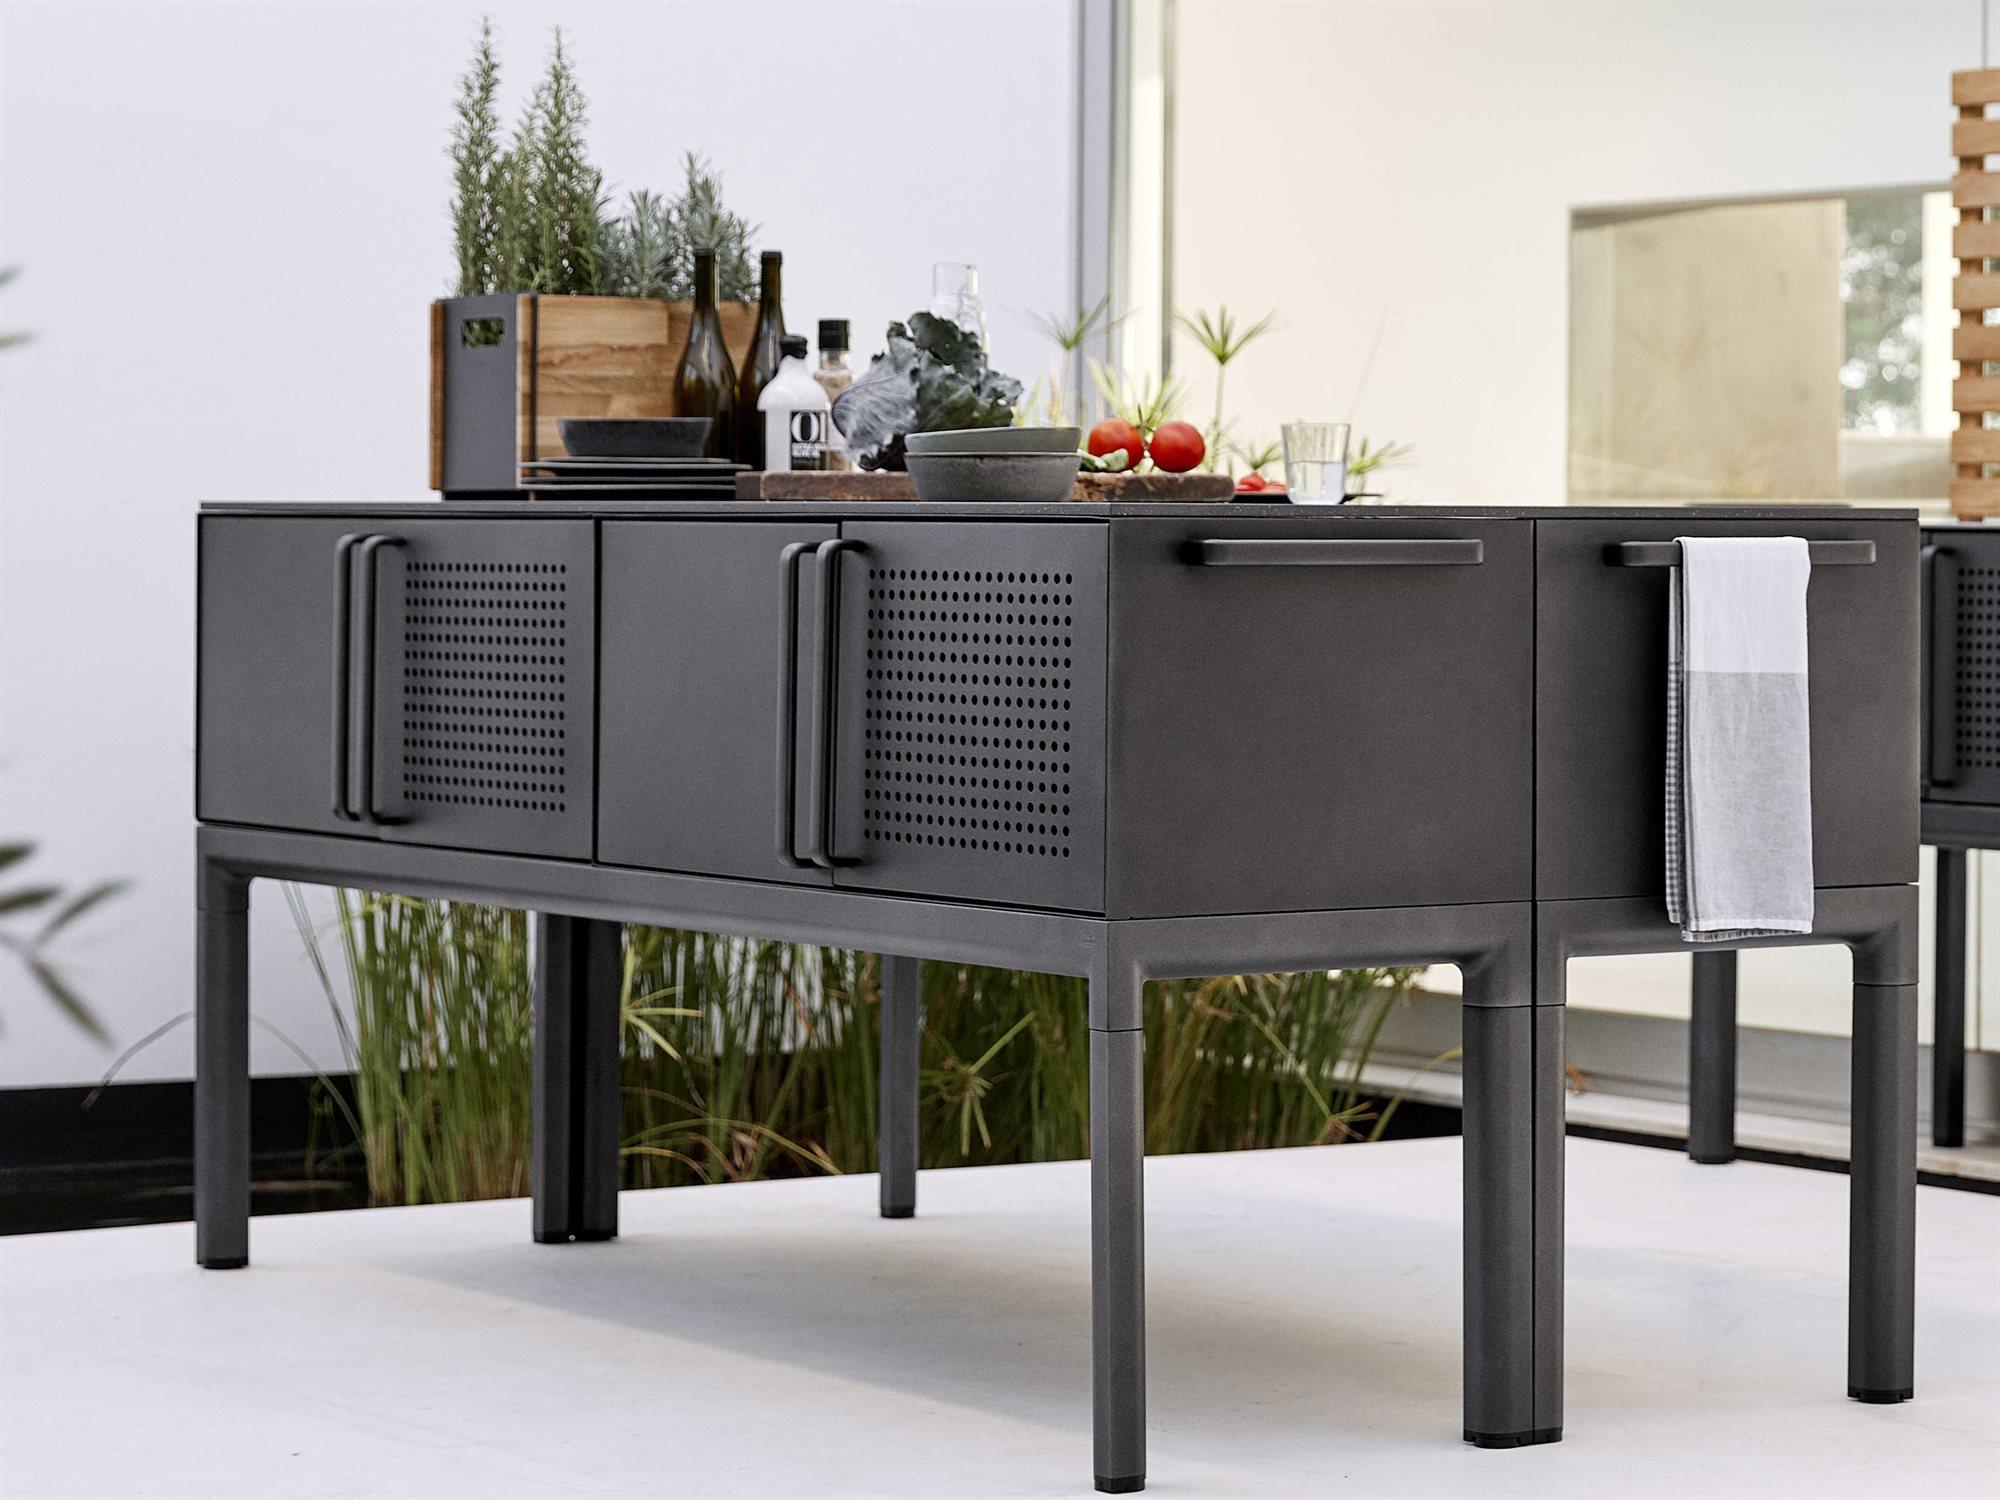 Picture of: Cane Line Outdoor Fossil Black Lava Grey 78 Wide Aluminum Rectangular Console Table Cnop091cobcno3550al